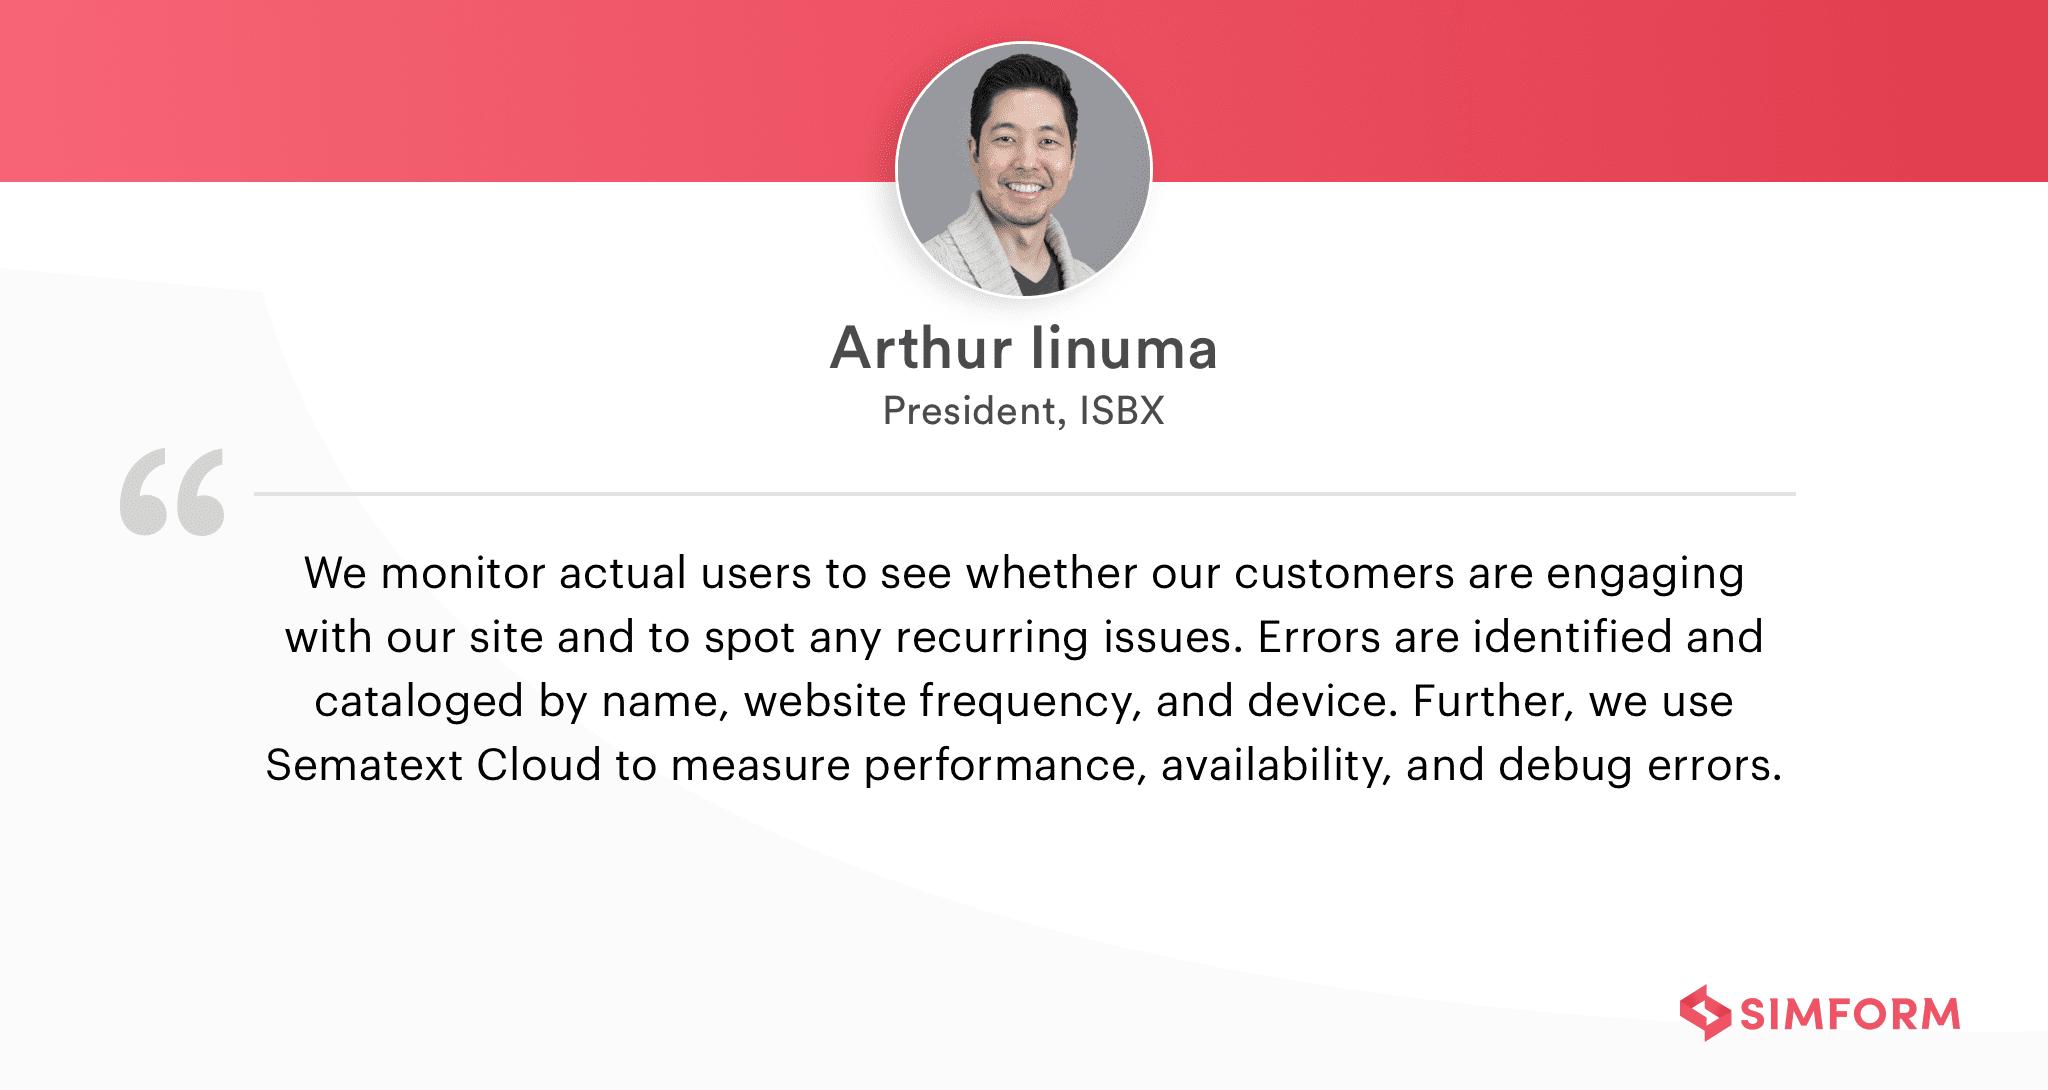 Arthur Iinuma on front-end monitoring